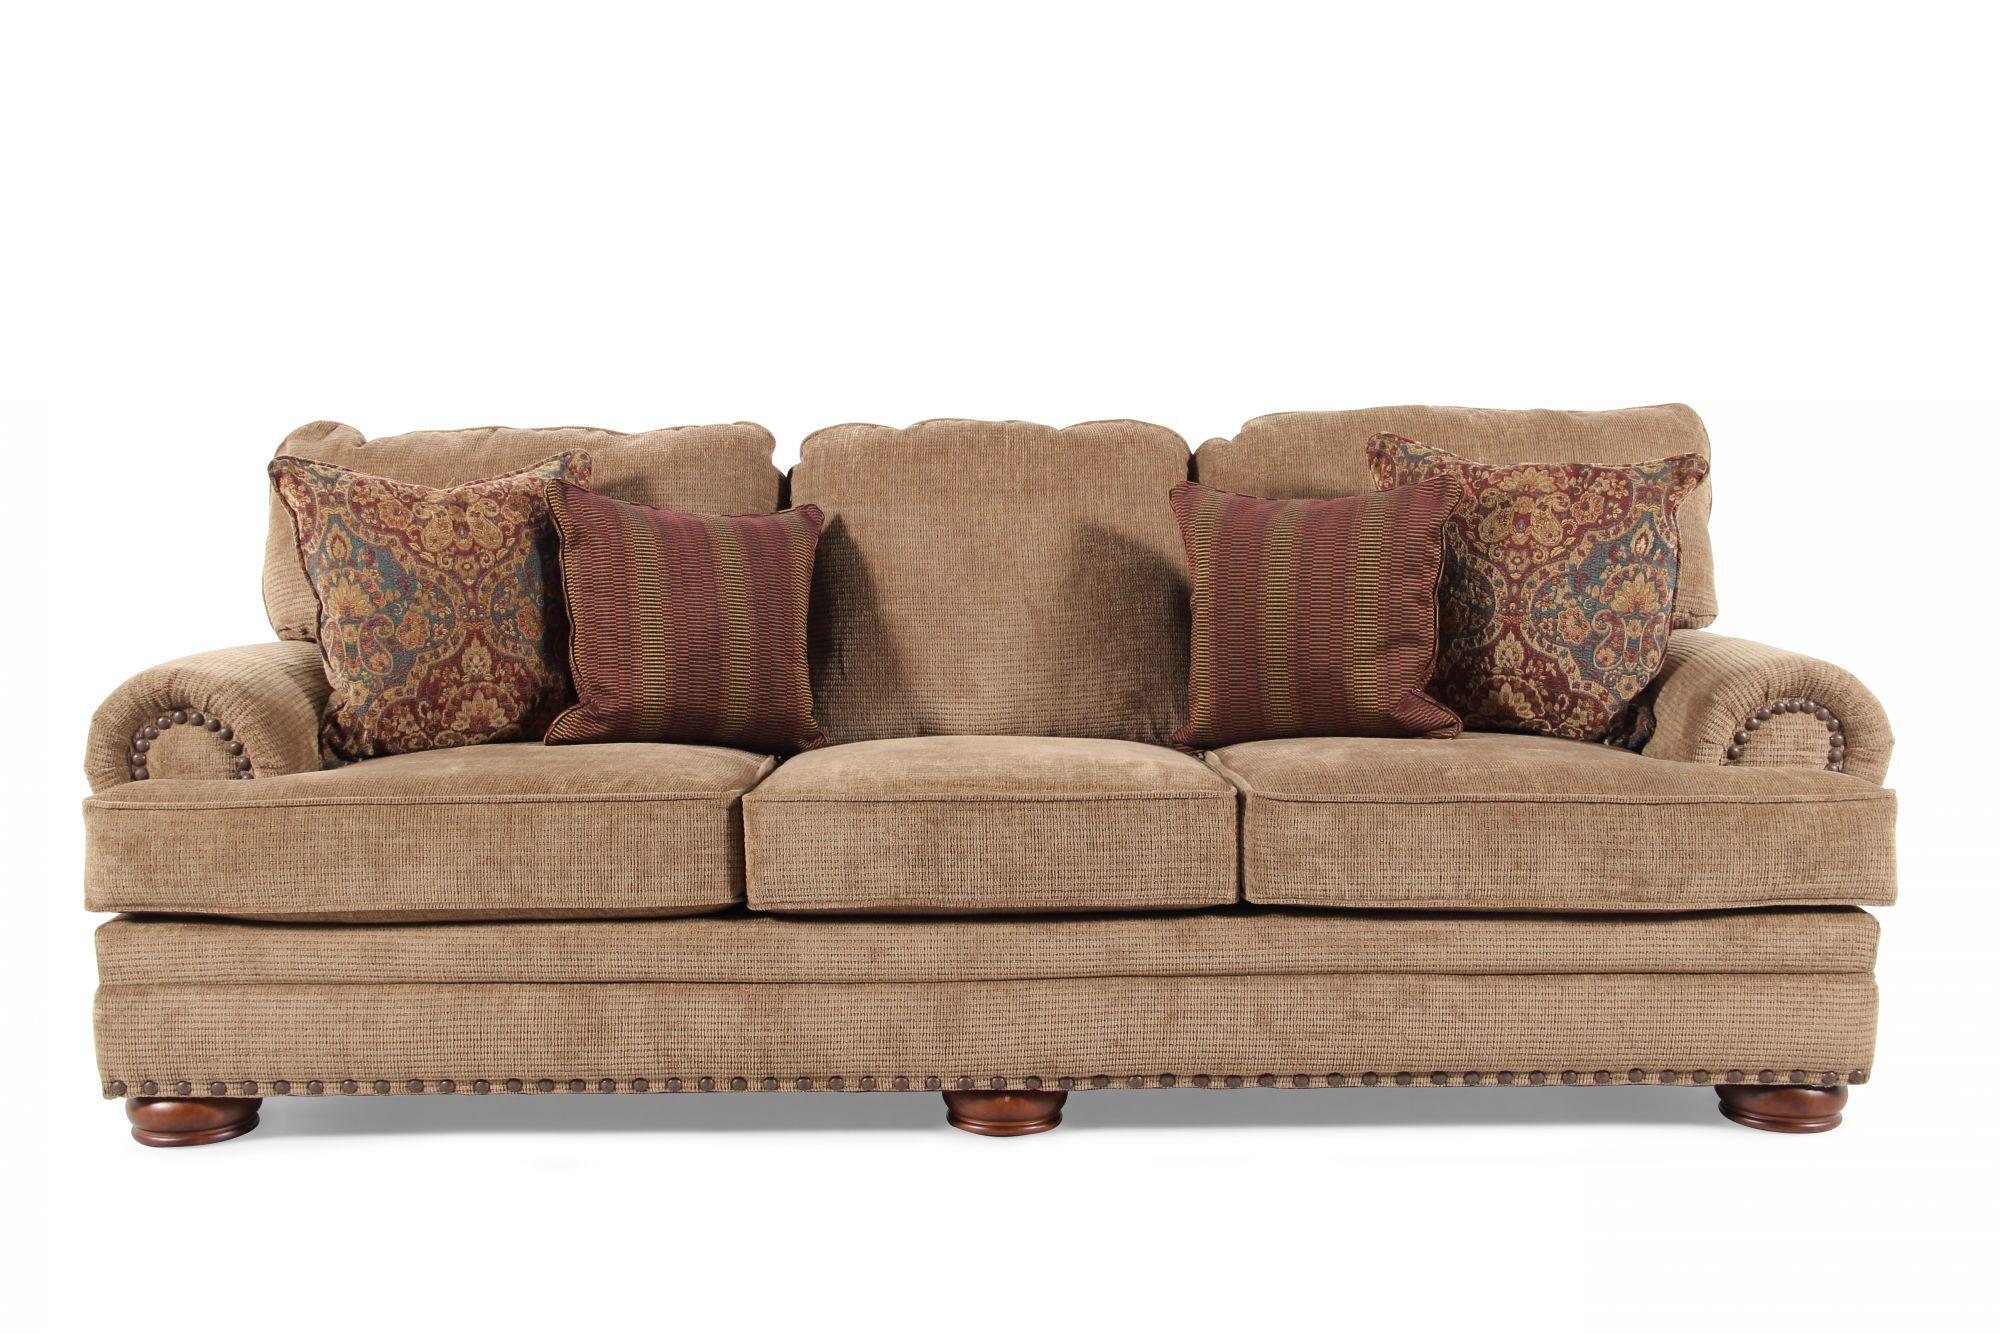 Nailhead Accented 101u0026quot; Sofa In Desert Brown